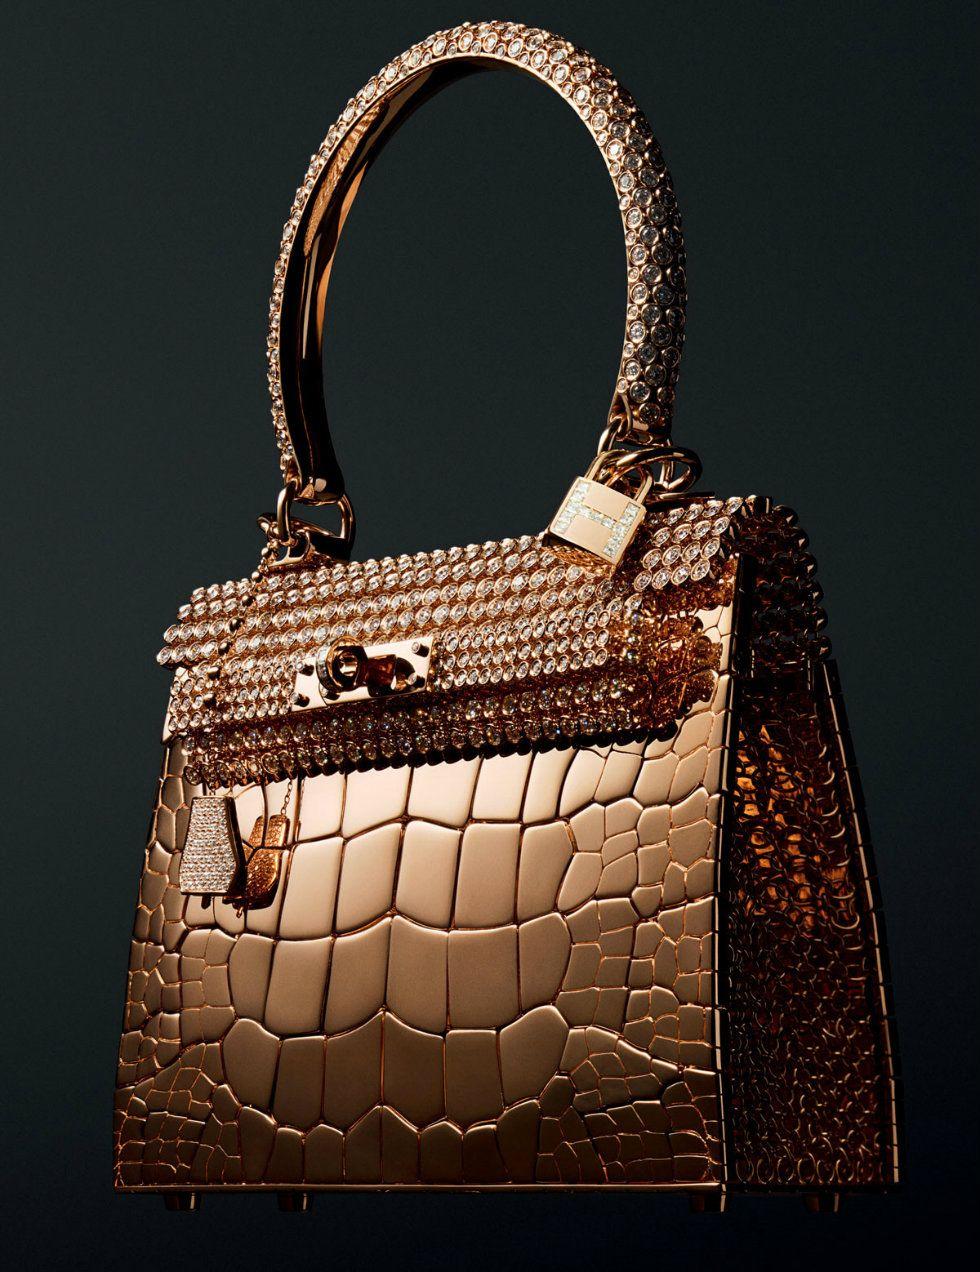 9e534008401c Milan Shopping Christmas  5 most luxury handbags brands for her ...